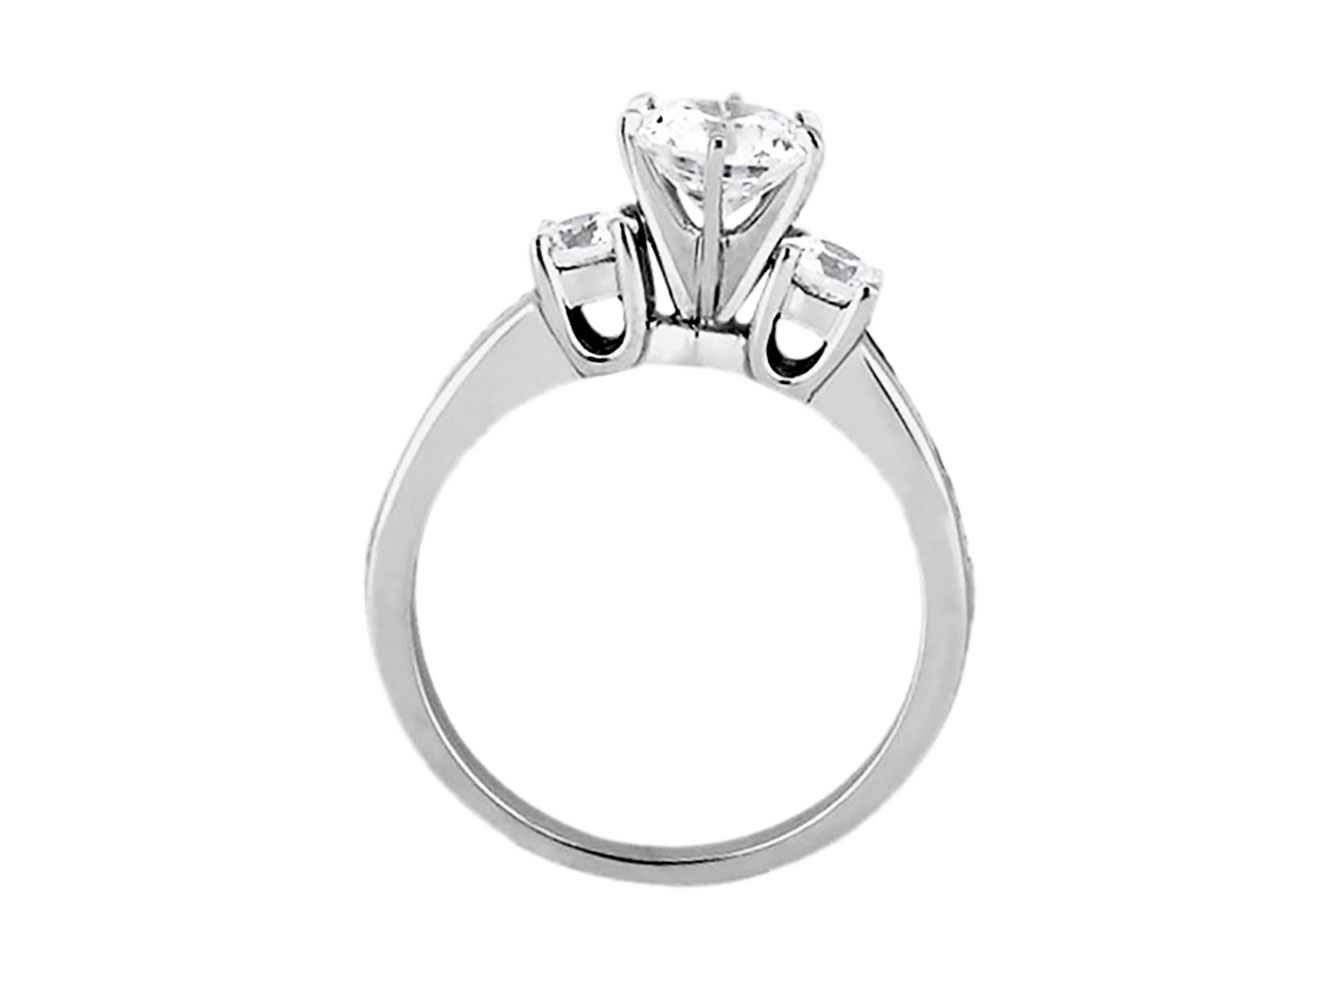 1-10-Quilates-Redondo-Princesa-Anillo-de-Compromiso-Diamante-Corte-10-Oro-Kl-I1 miniatura 9